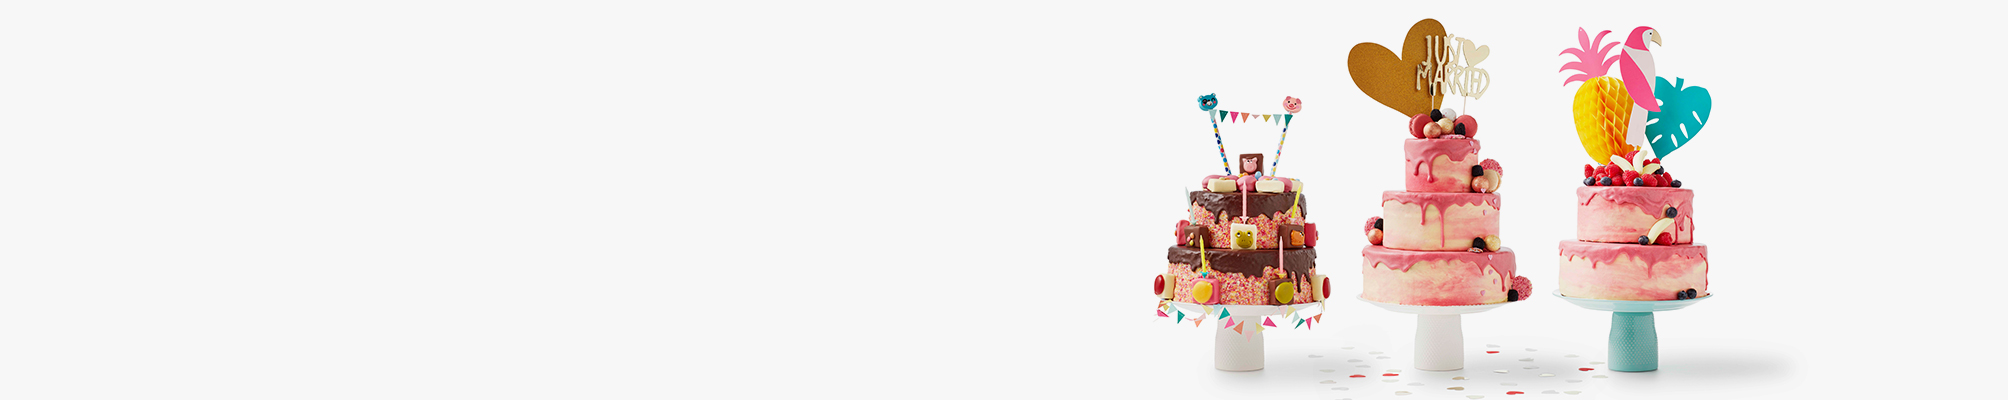 listerbanner-2018-wk27-dripcakes-v3